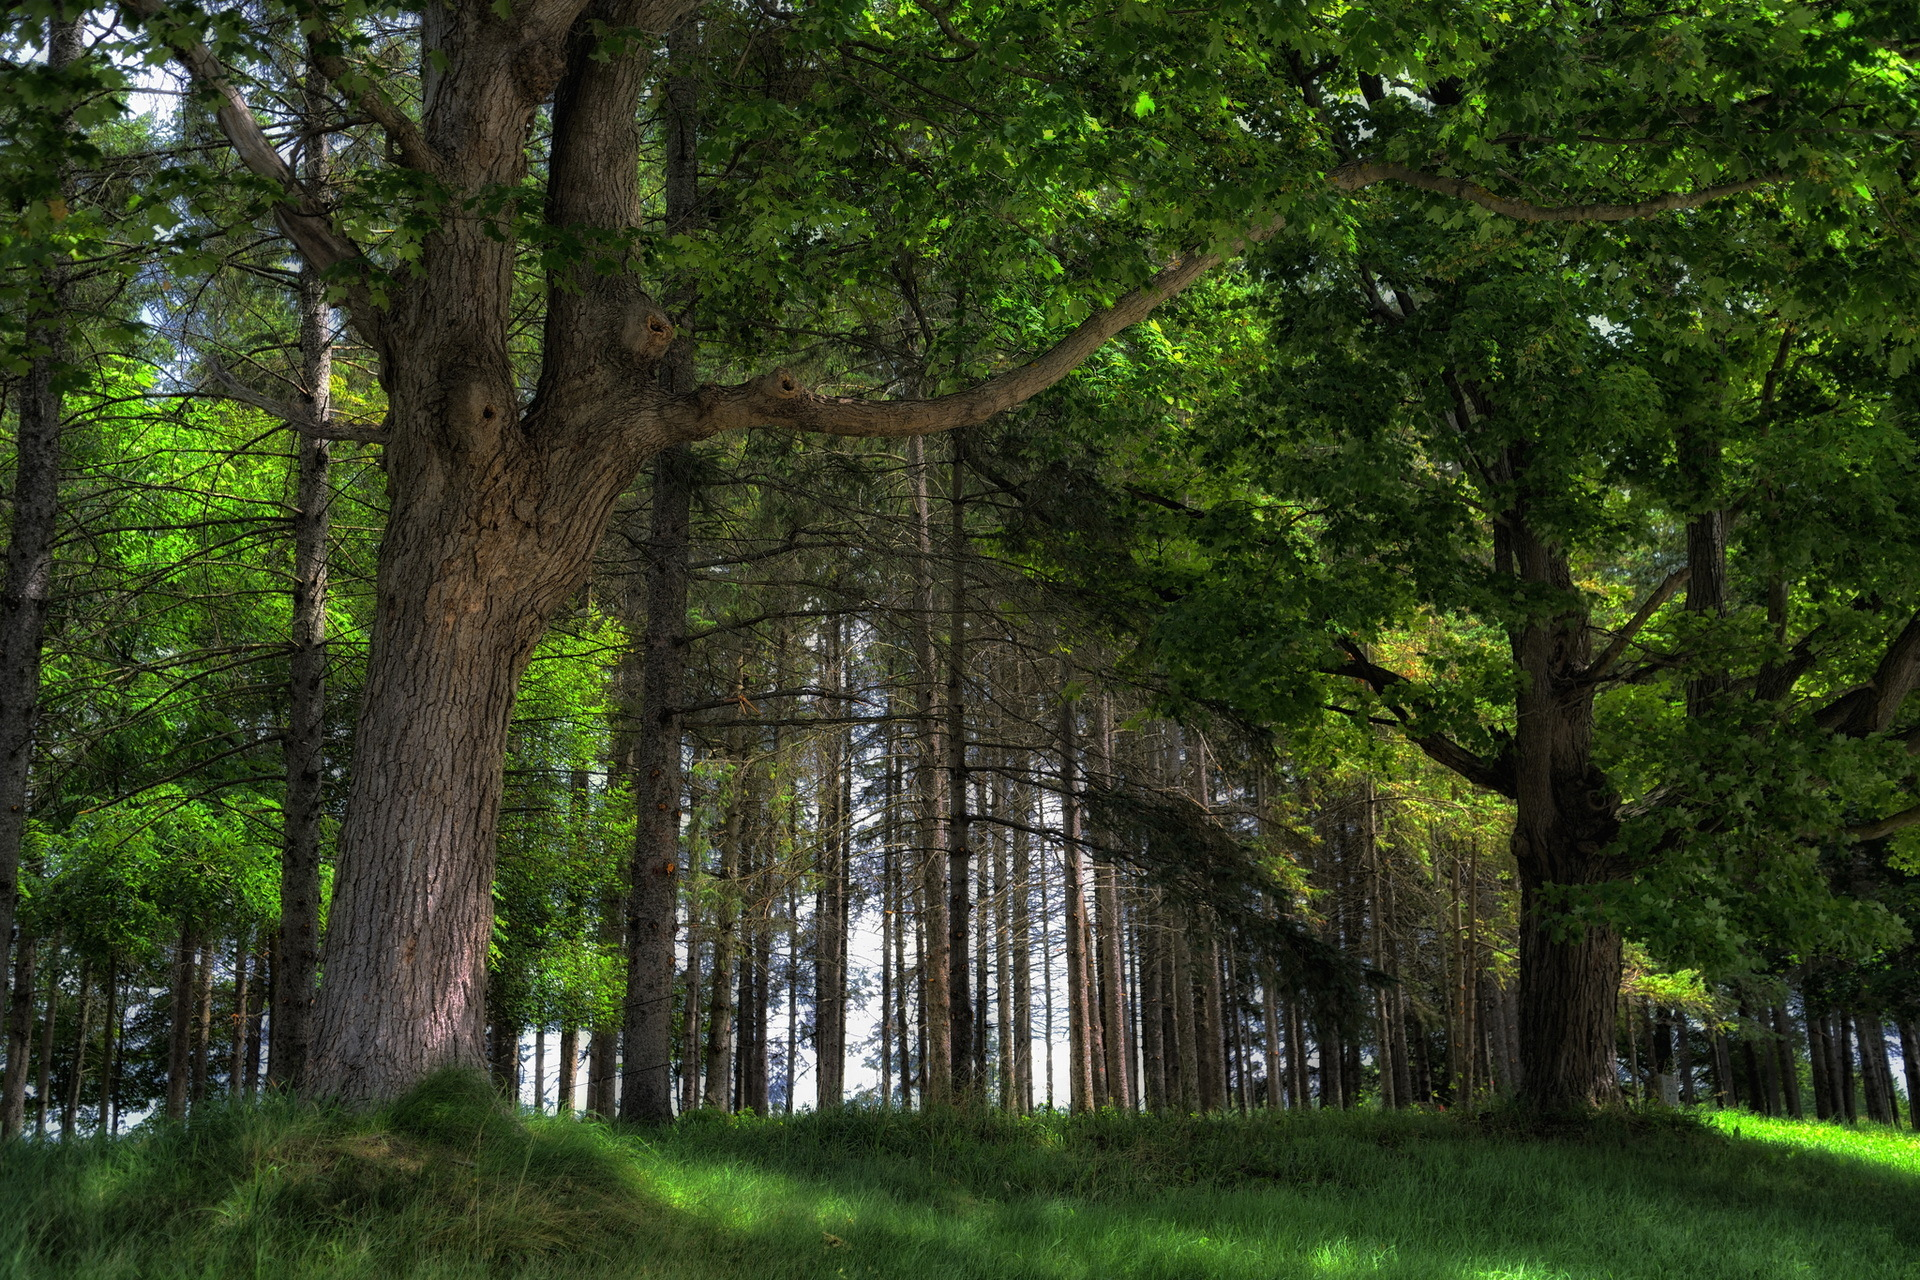 Cool Nature Desktop Backgrounds: Free Spring Forest 4K Ultra HD